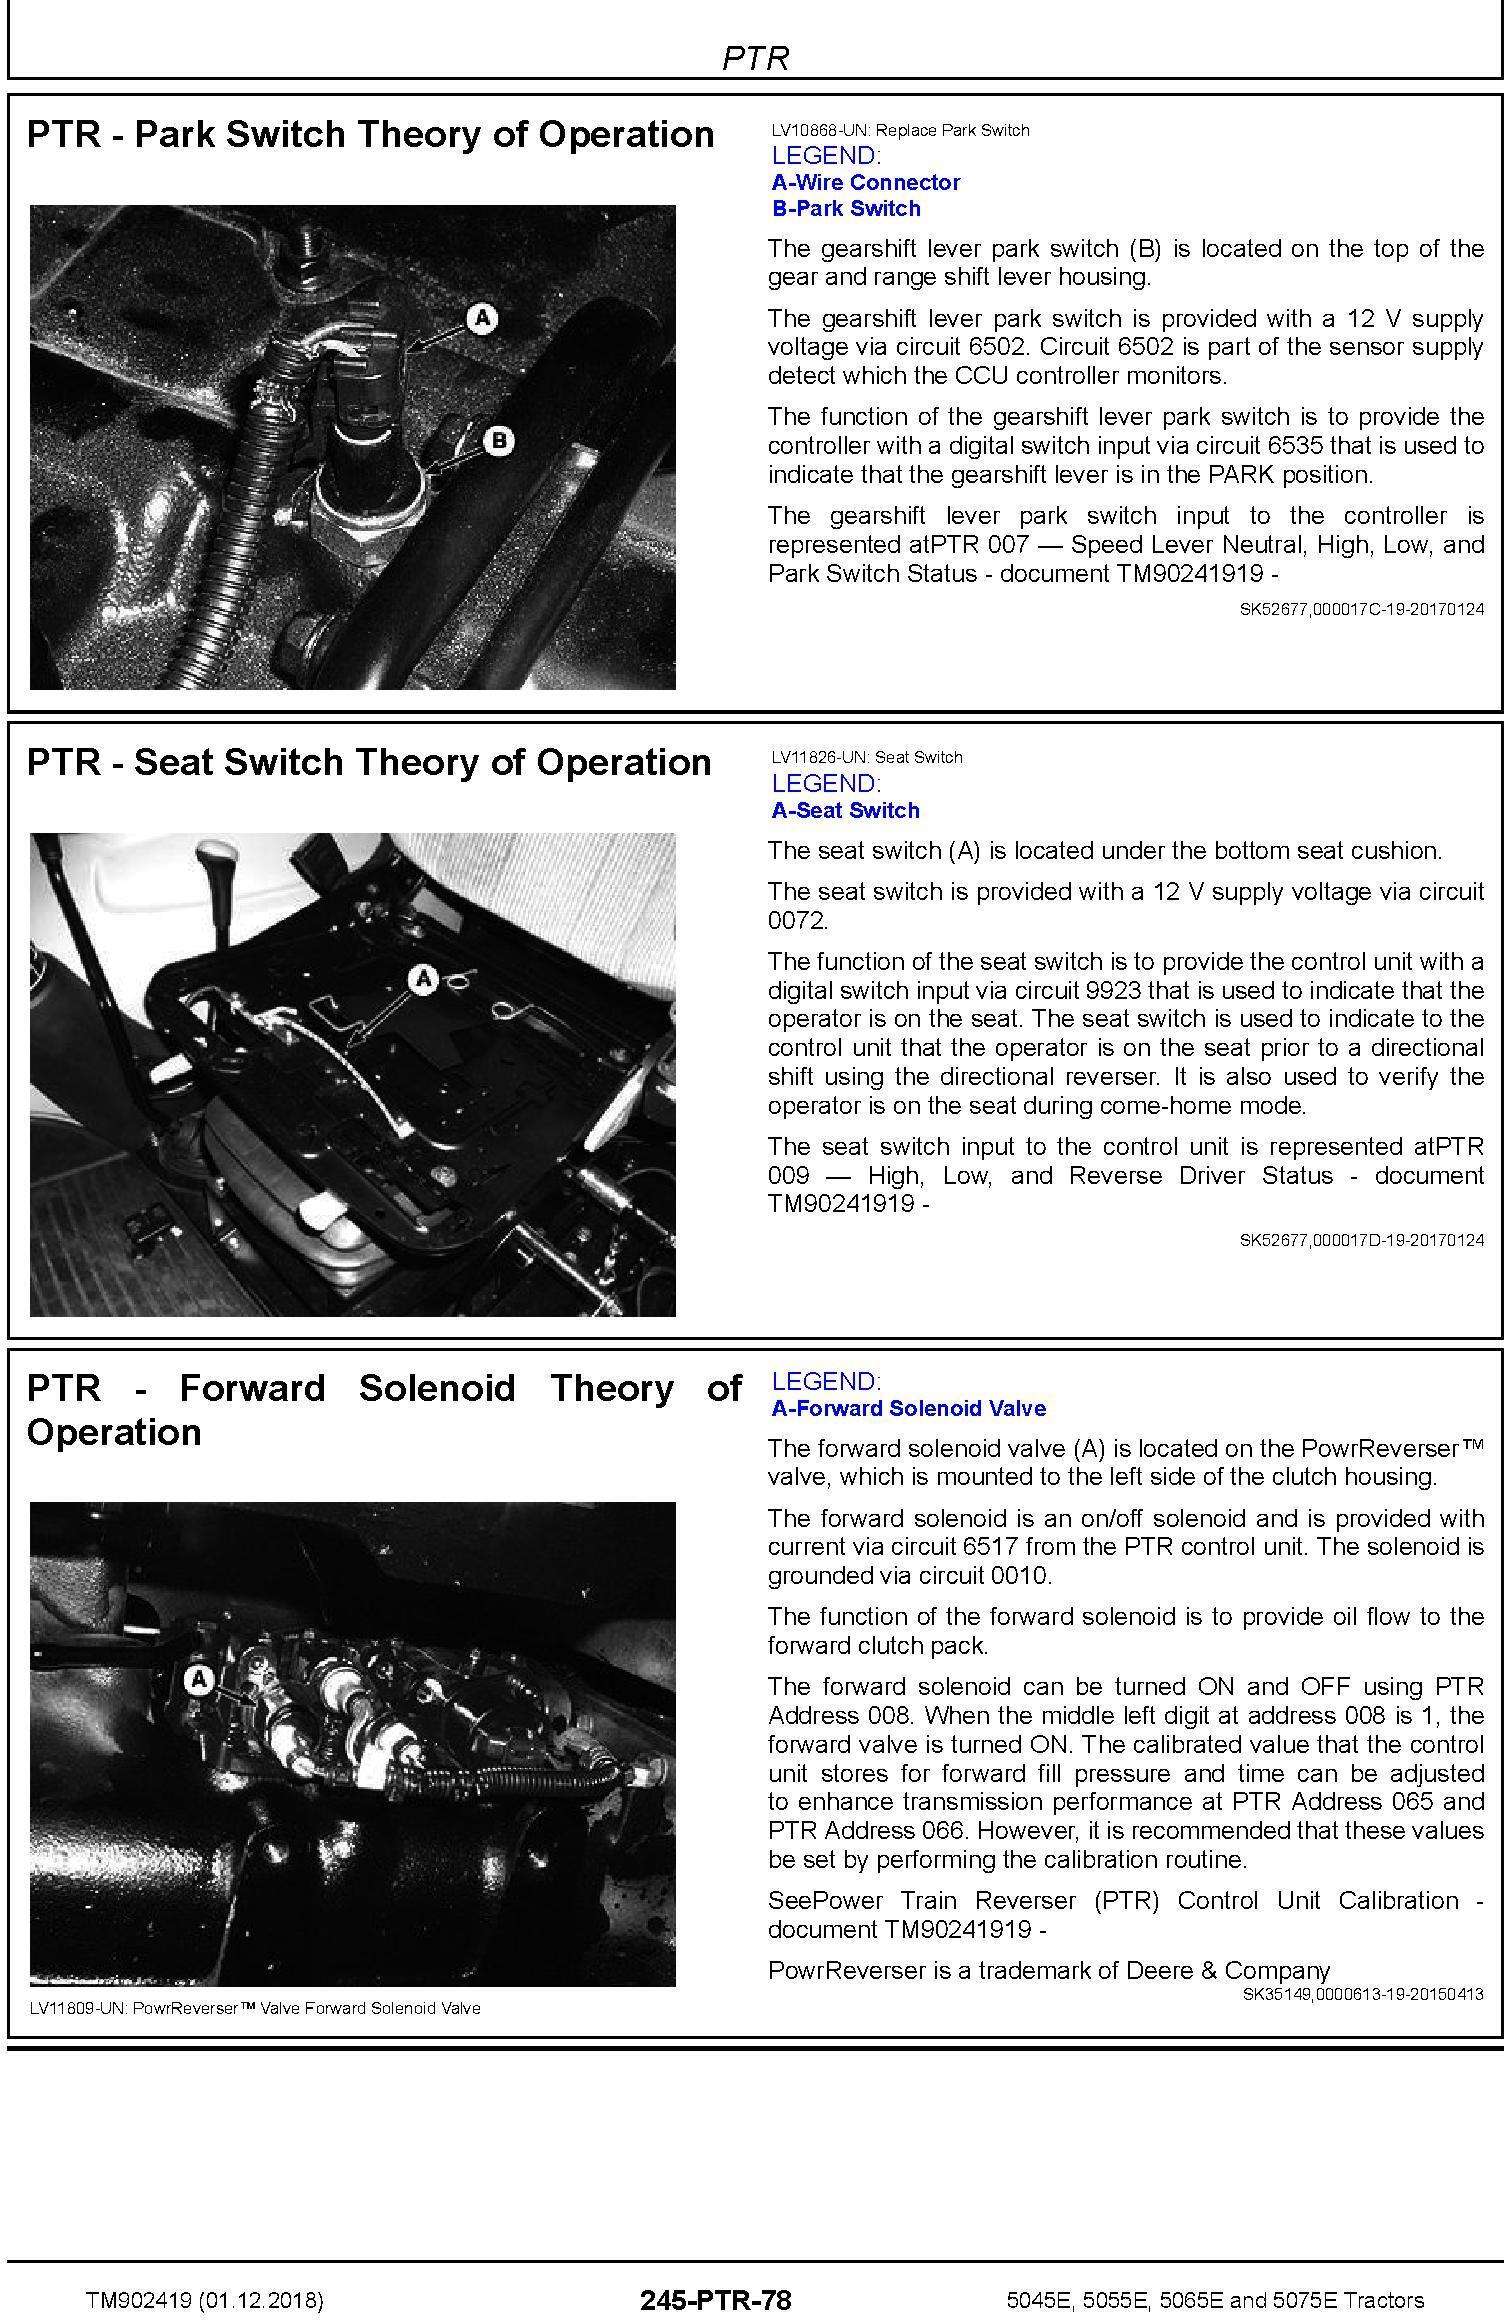 John Deere 5045E, 5055E, 5065E, 5075E USA Tractors Diagnostic Technical Service Manual (TM902419) - 1